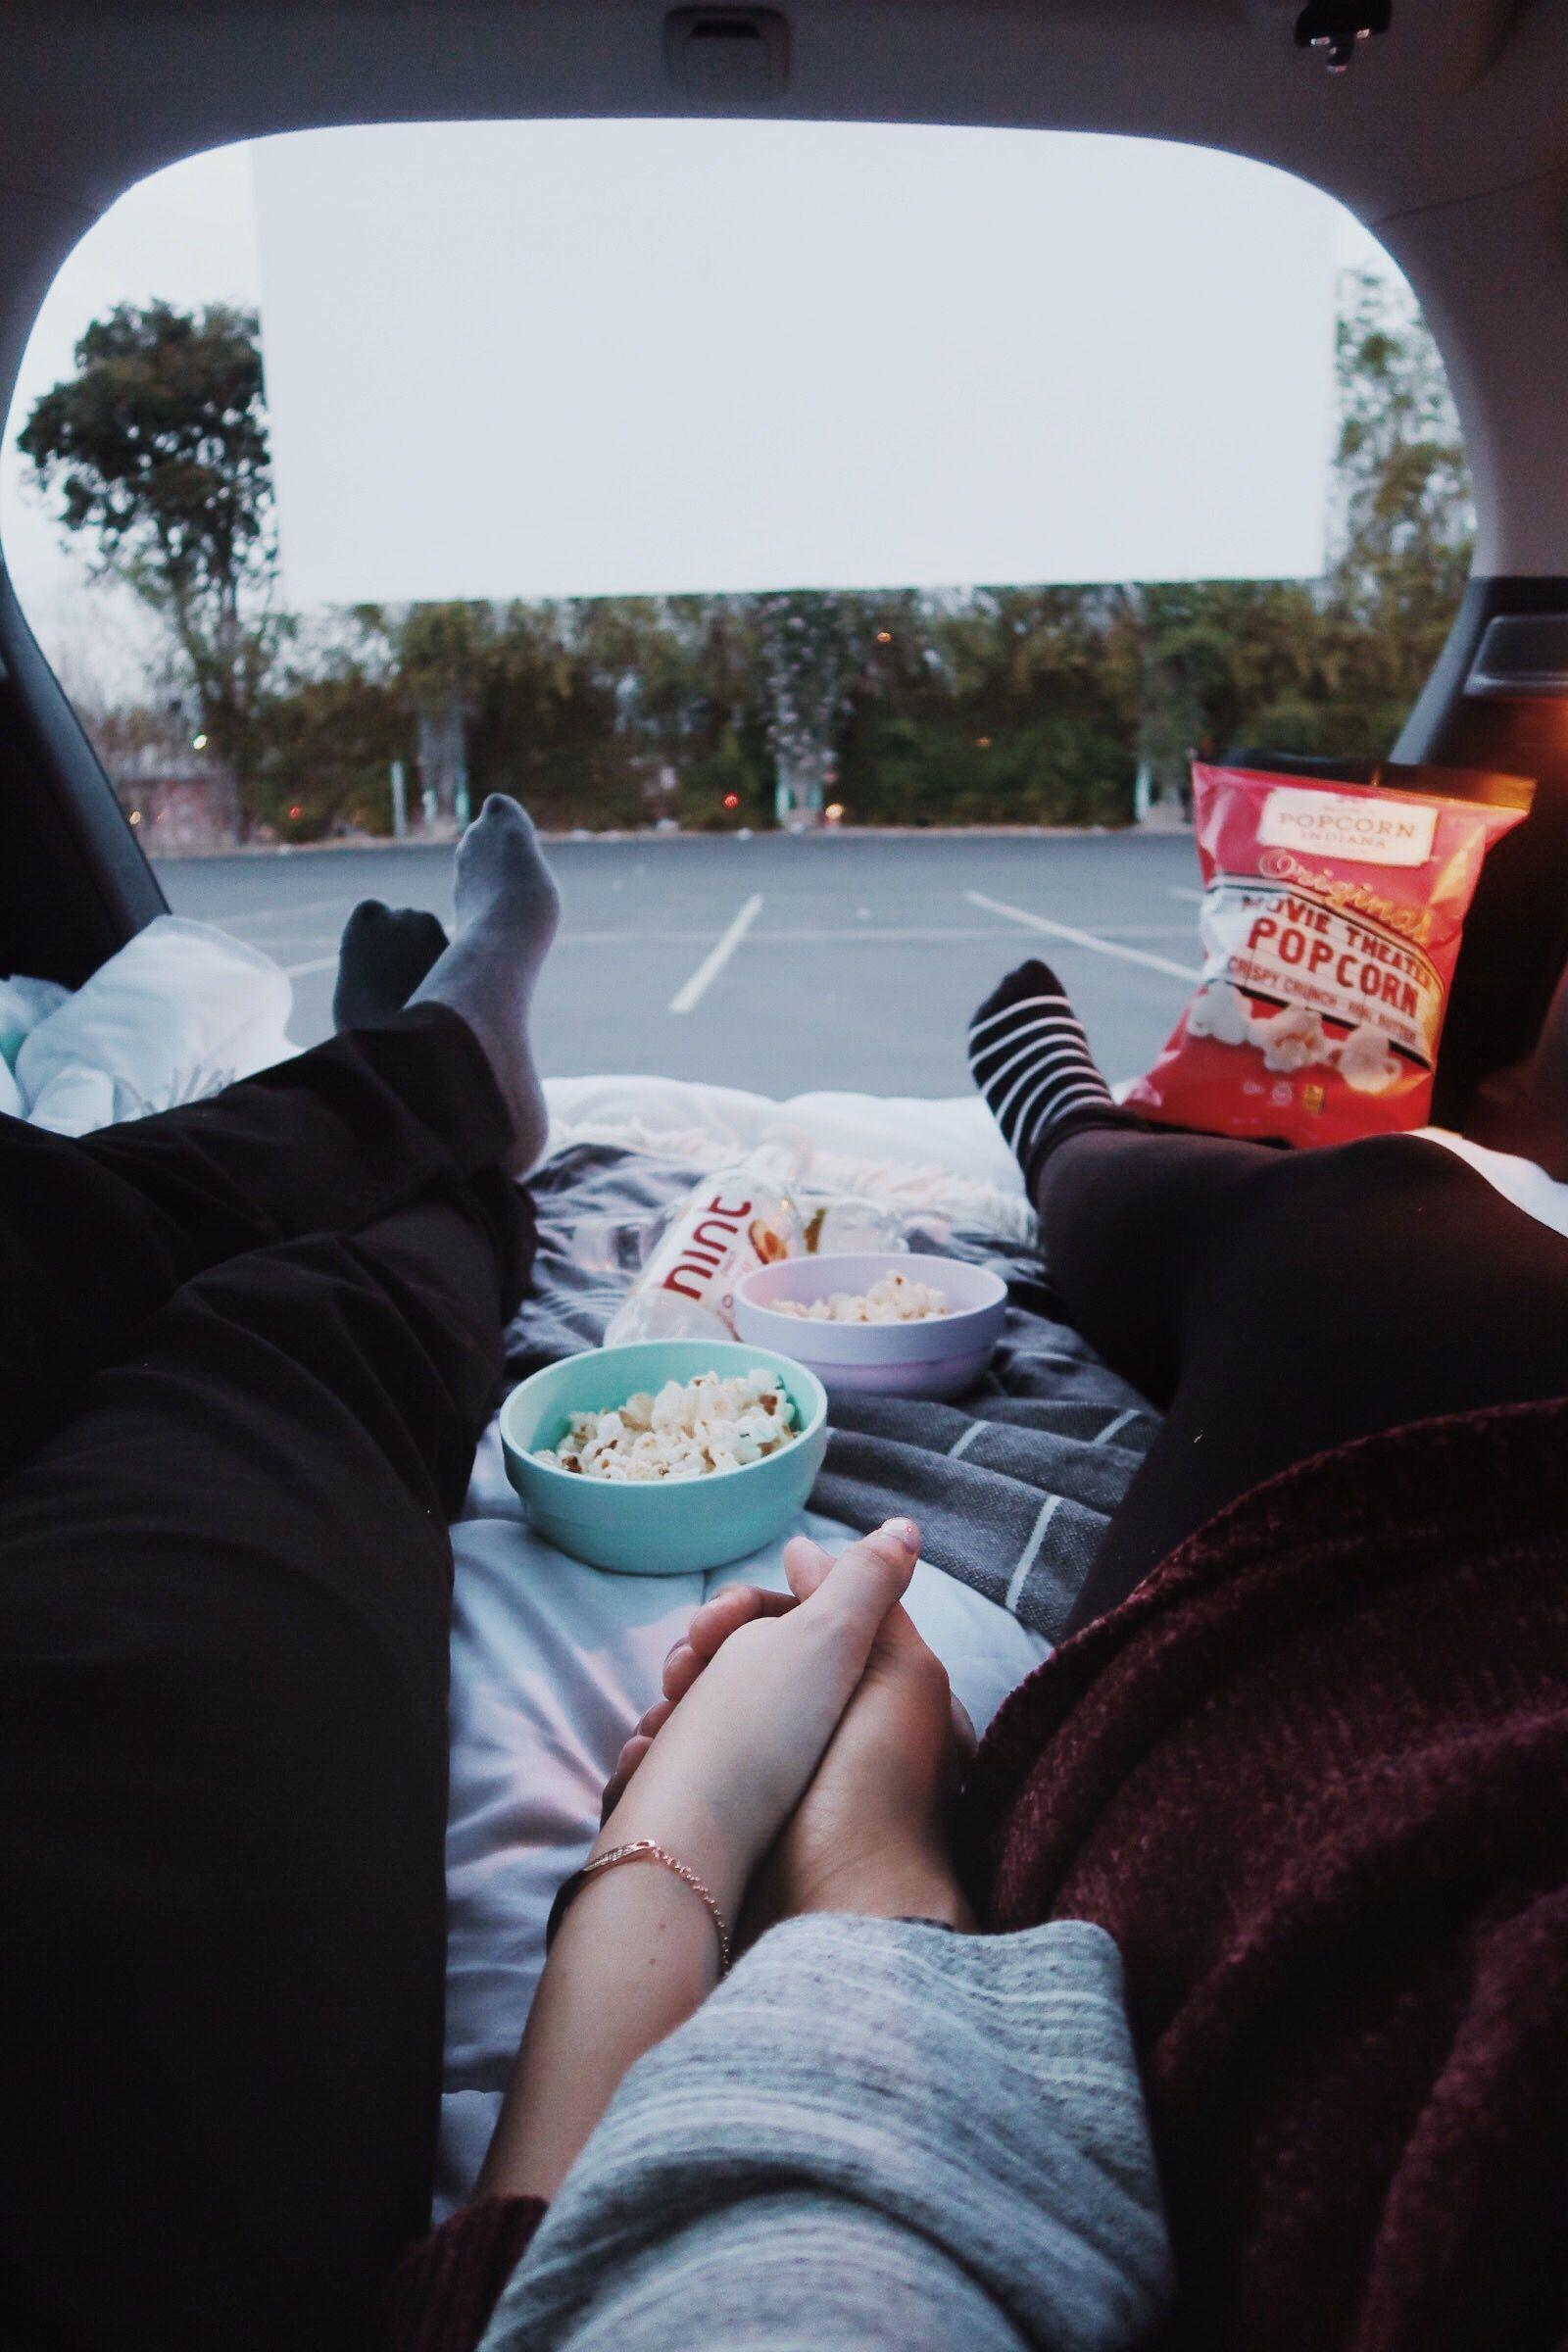 gratis online dating sverige 10 ore Nickelmountain